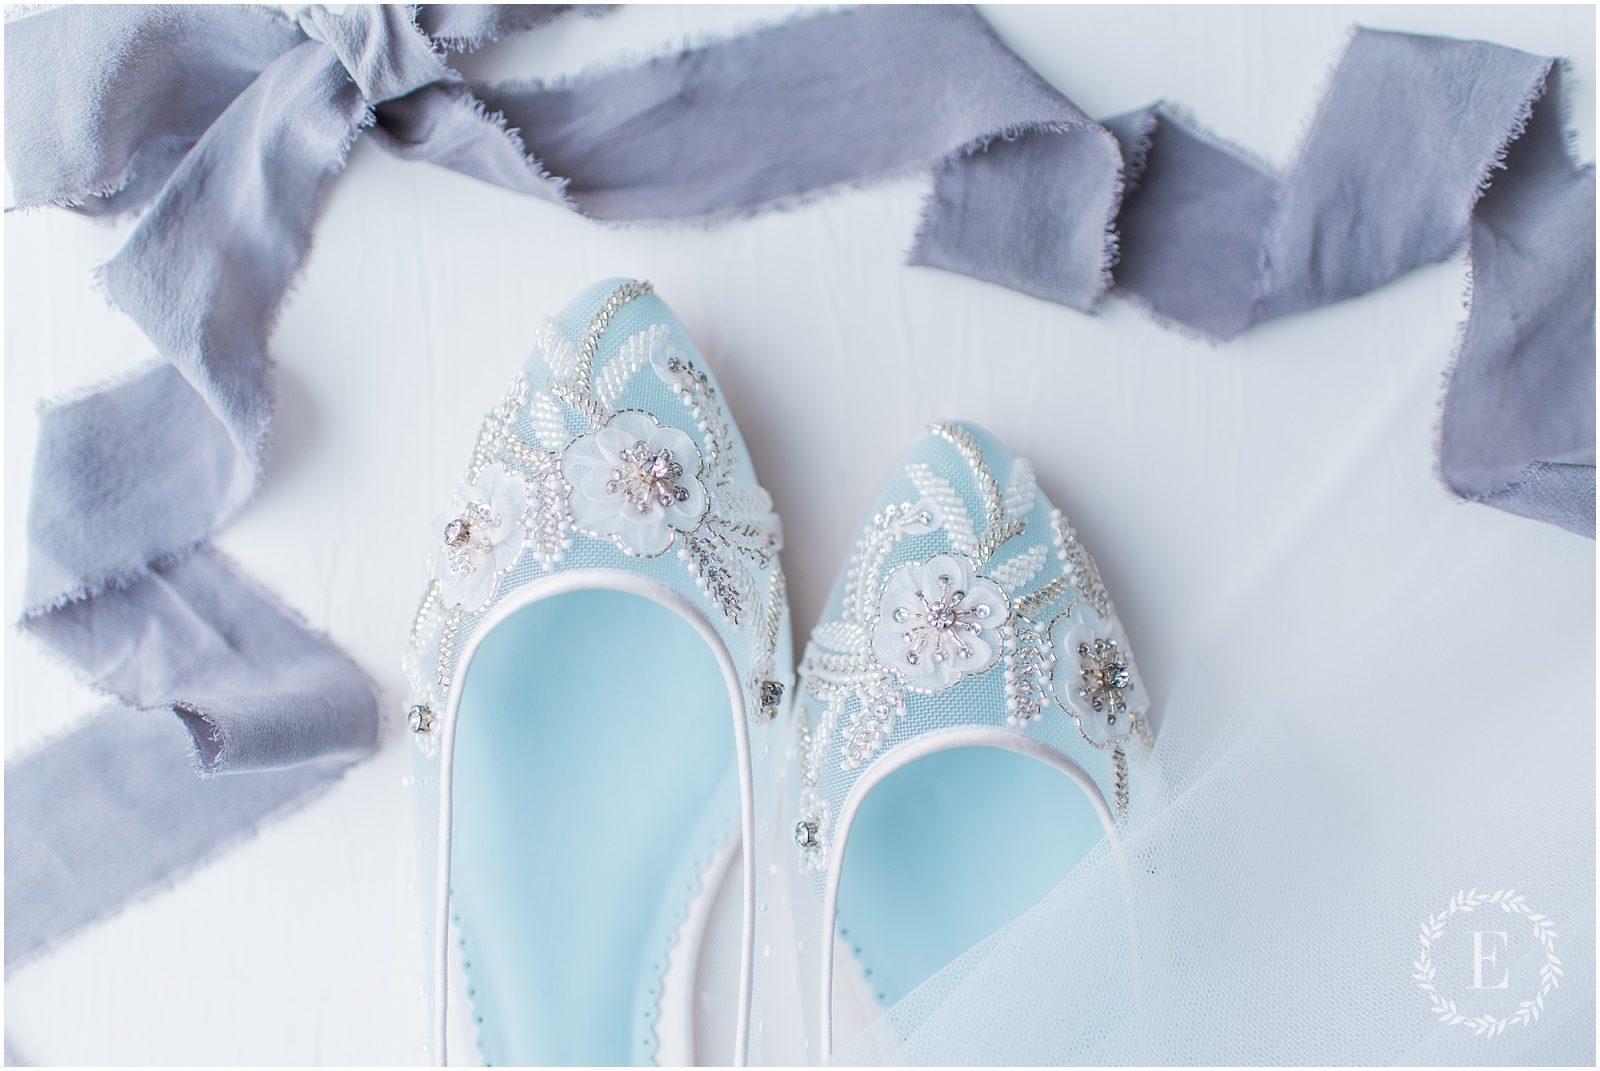 67 - Bella Belle for Fairy Dreams Bridal - PhotosbyEmmaH 2019.jpg